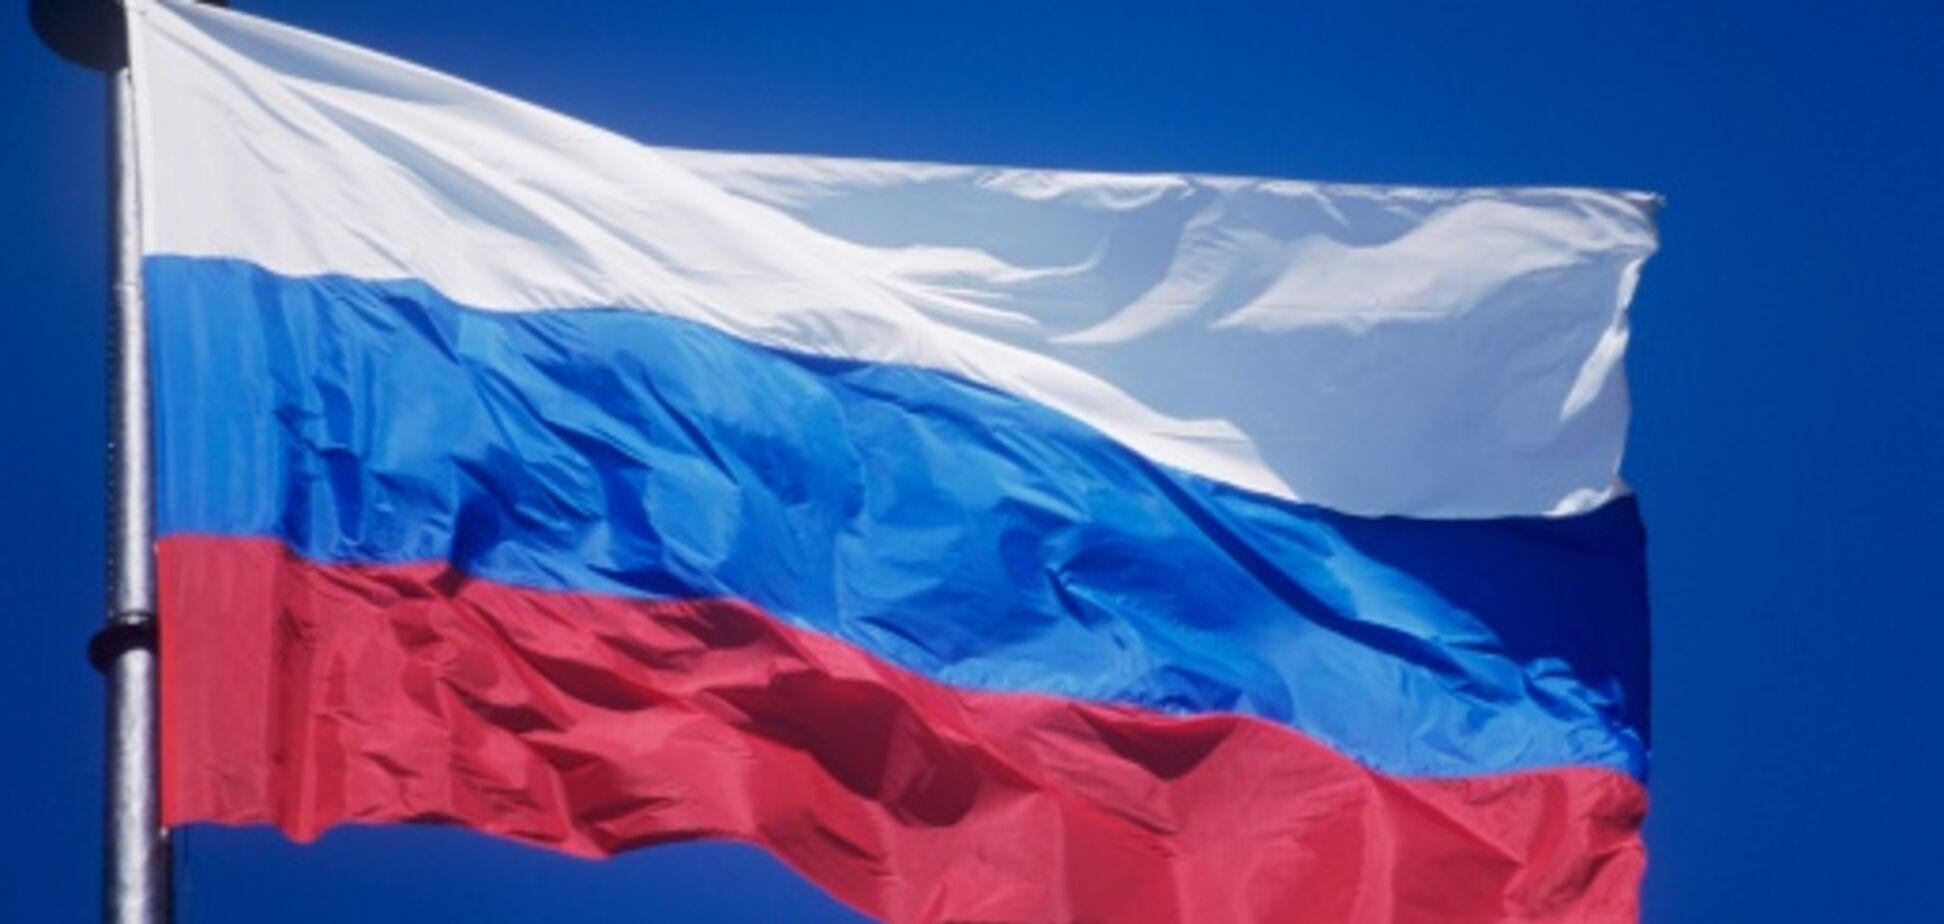 'Украину поставили перед жестким вызовом': у Лаврова обвинили Запад